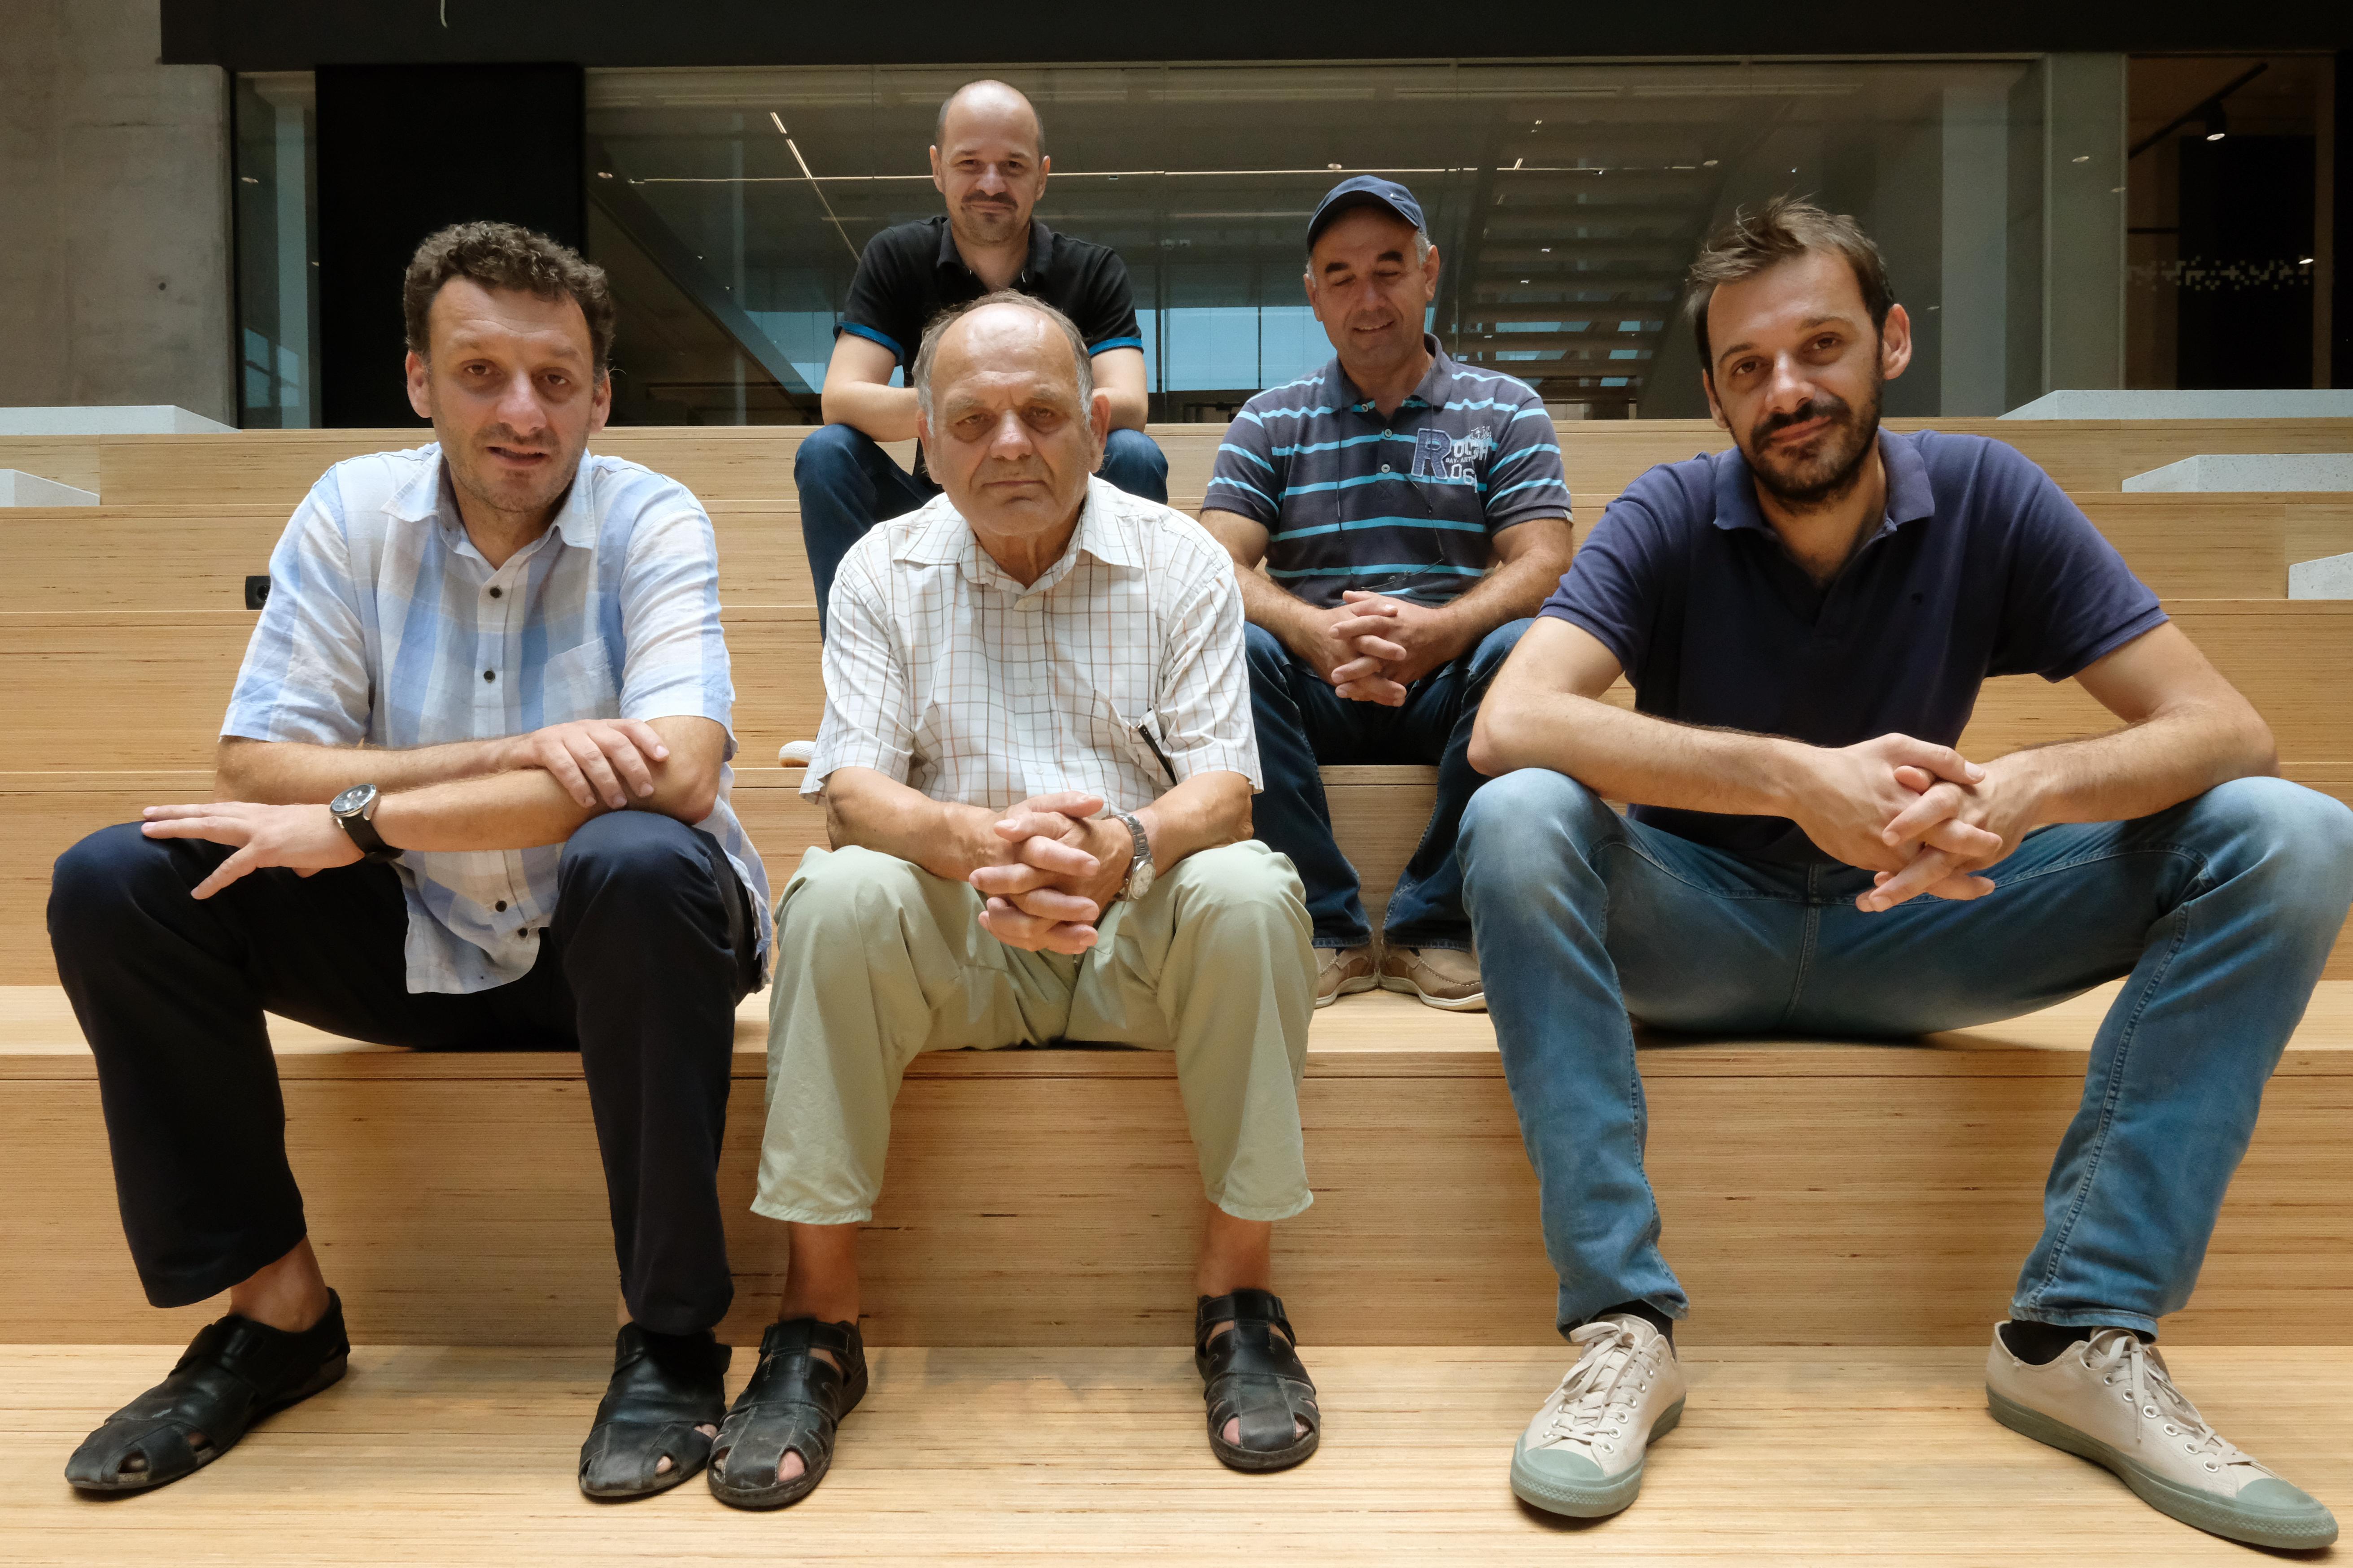 Roberto, Silvestar i Silvio Kutić (prvi red) te Erwin Rotta i Petar Radić